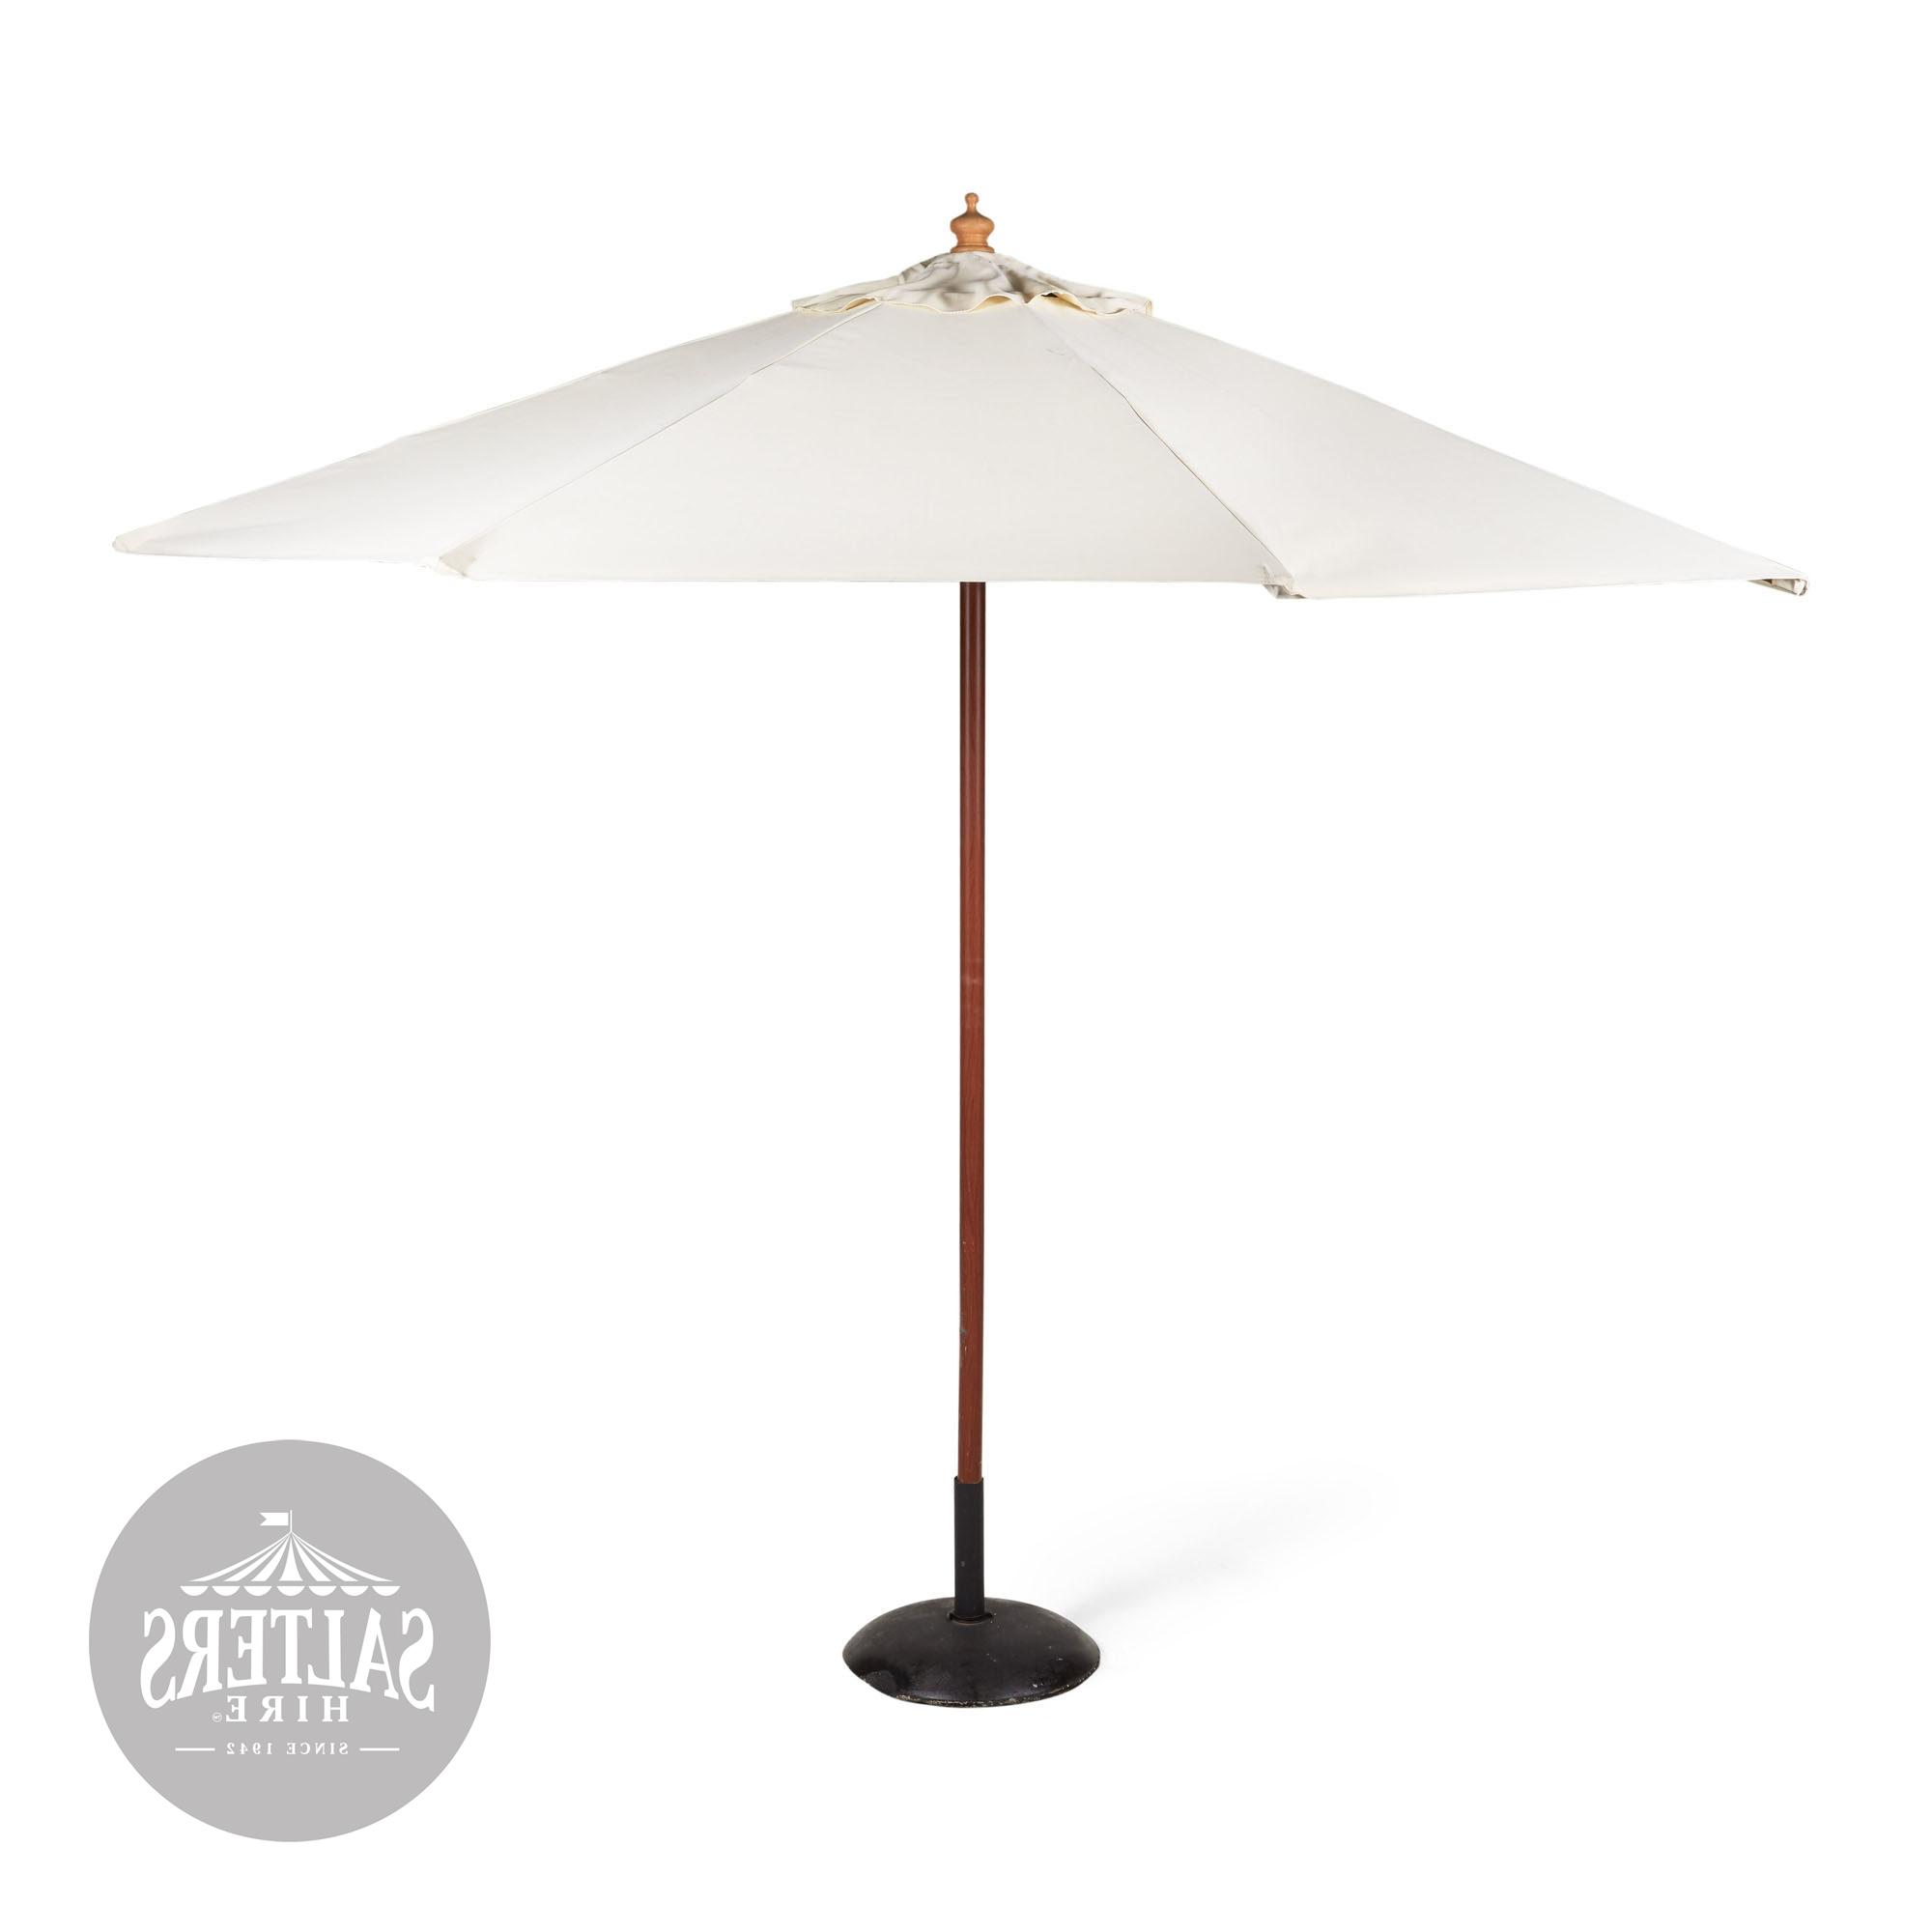 Market Umbrella – 3m No Stand With Regard To Current Launceston Market Umbrellas (View 5 of 20)